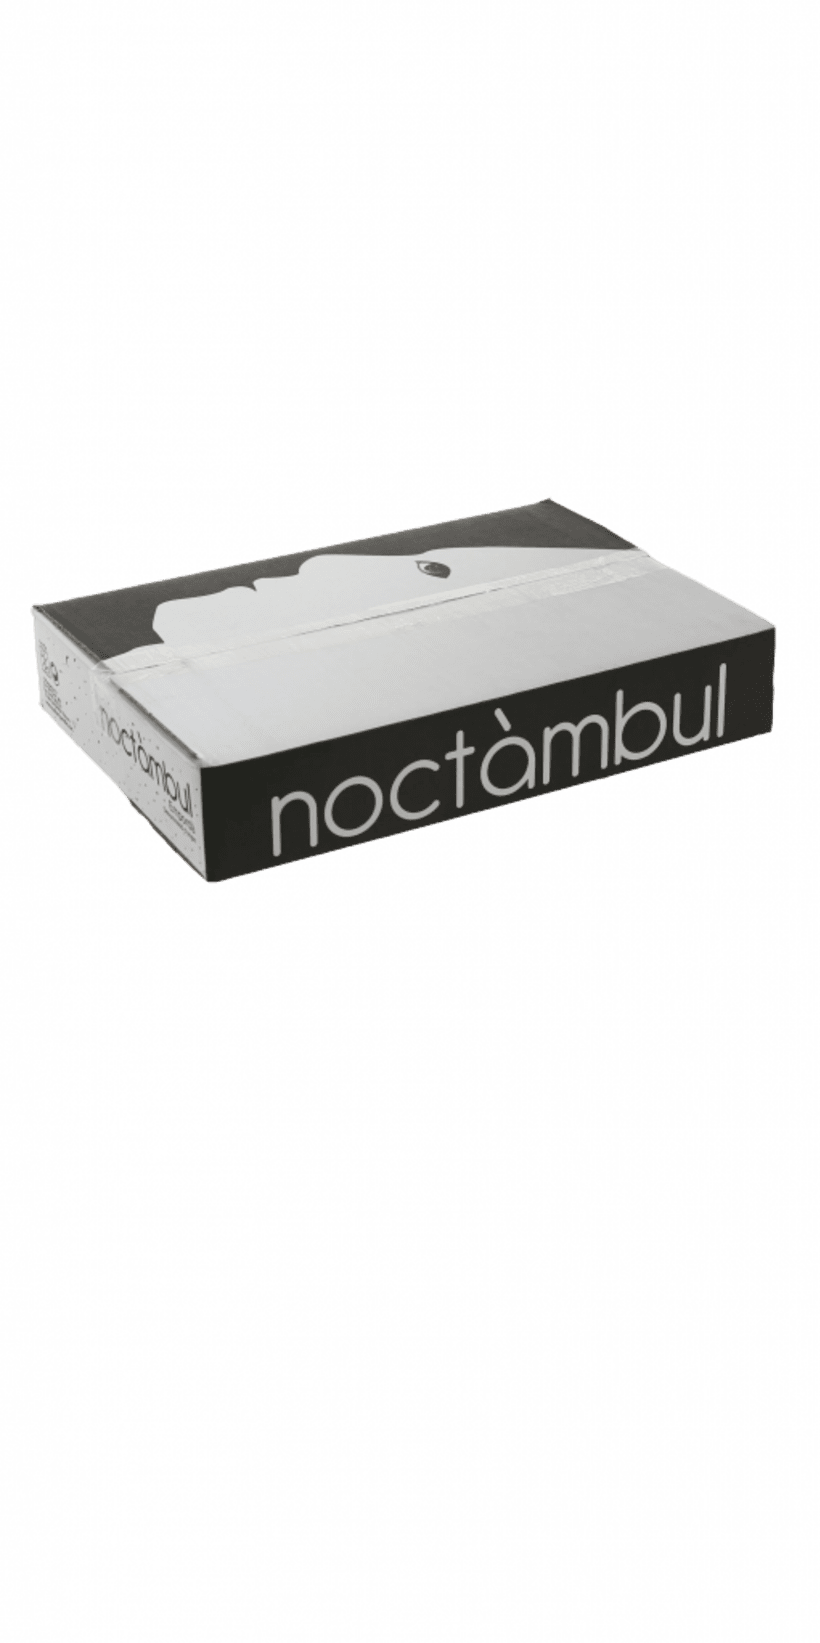 NOCTÀMBUL 2